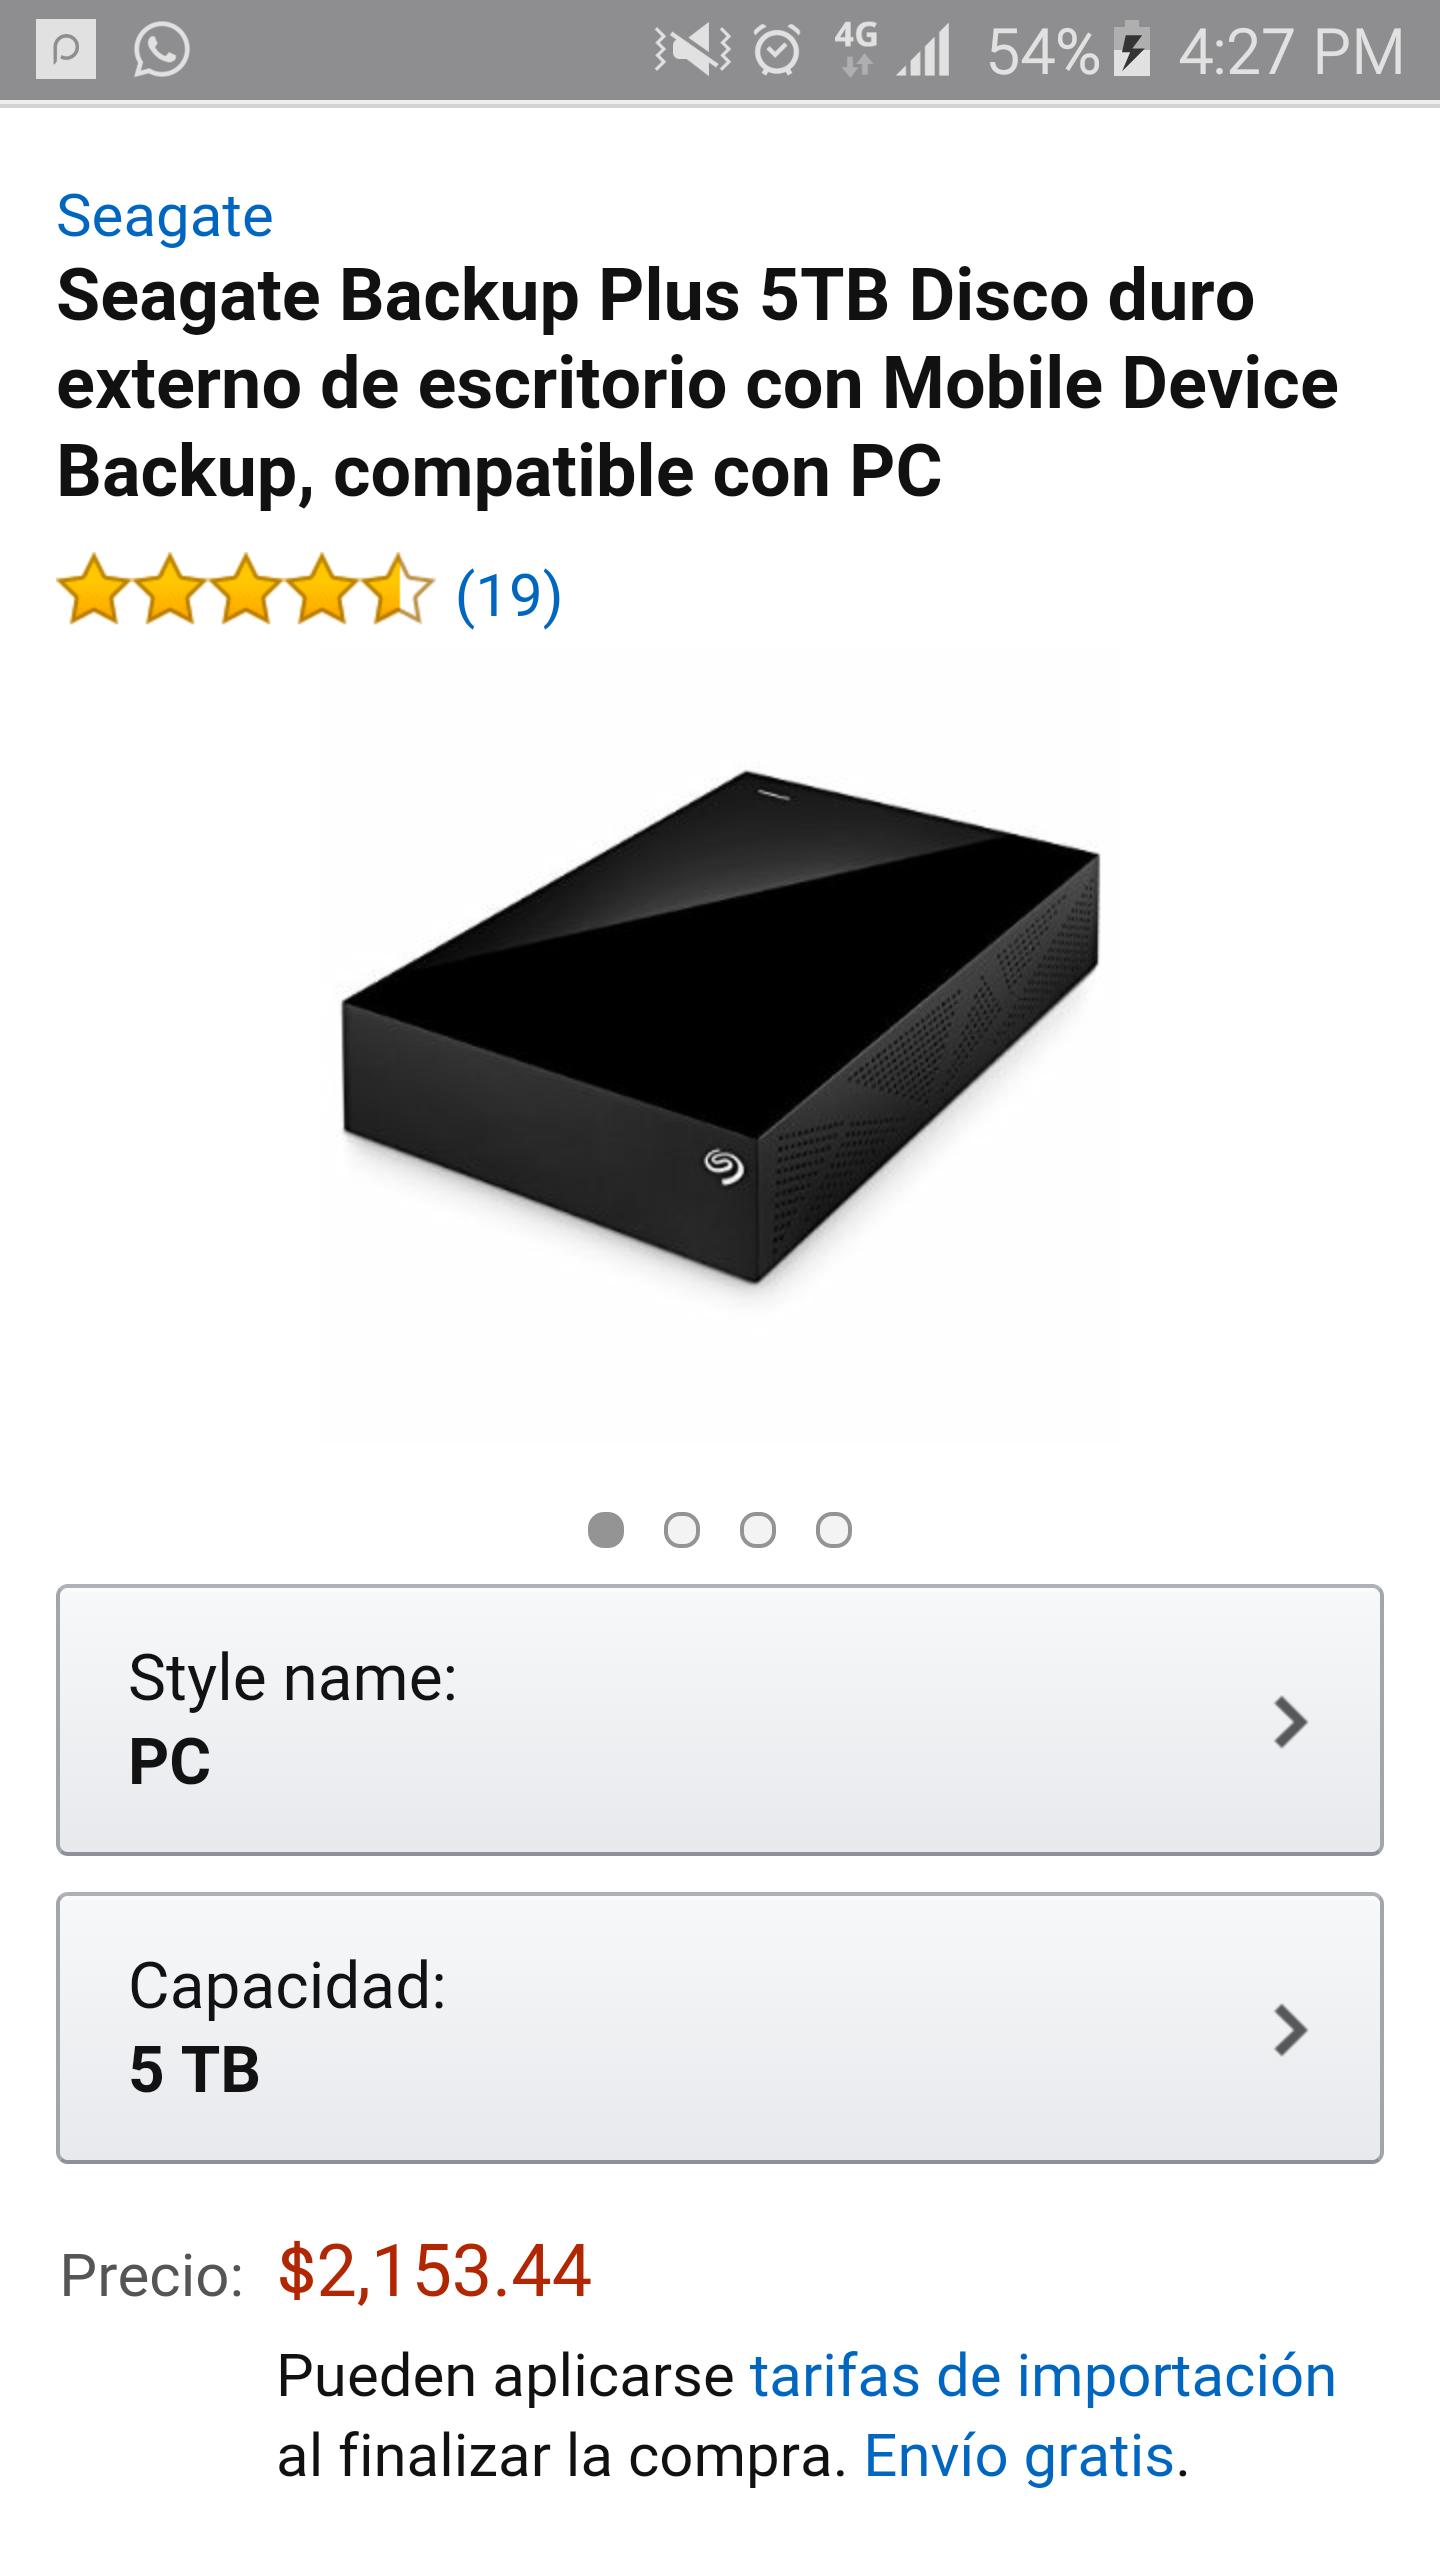 Amazon: disco duro externo 5tb a $2,154 ($1,854 con Banamex)